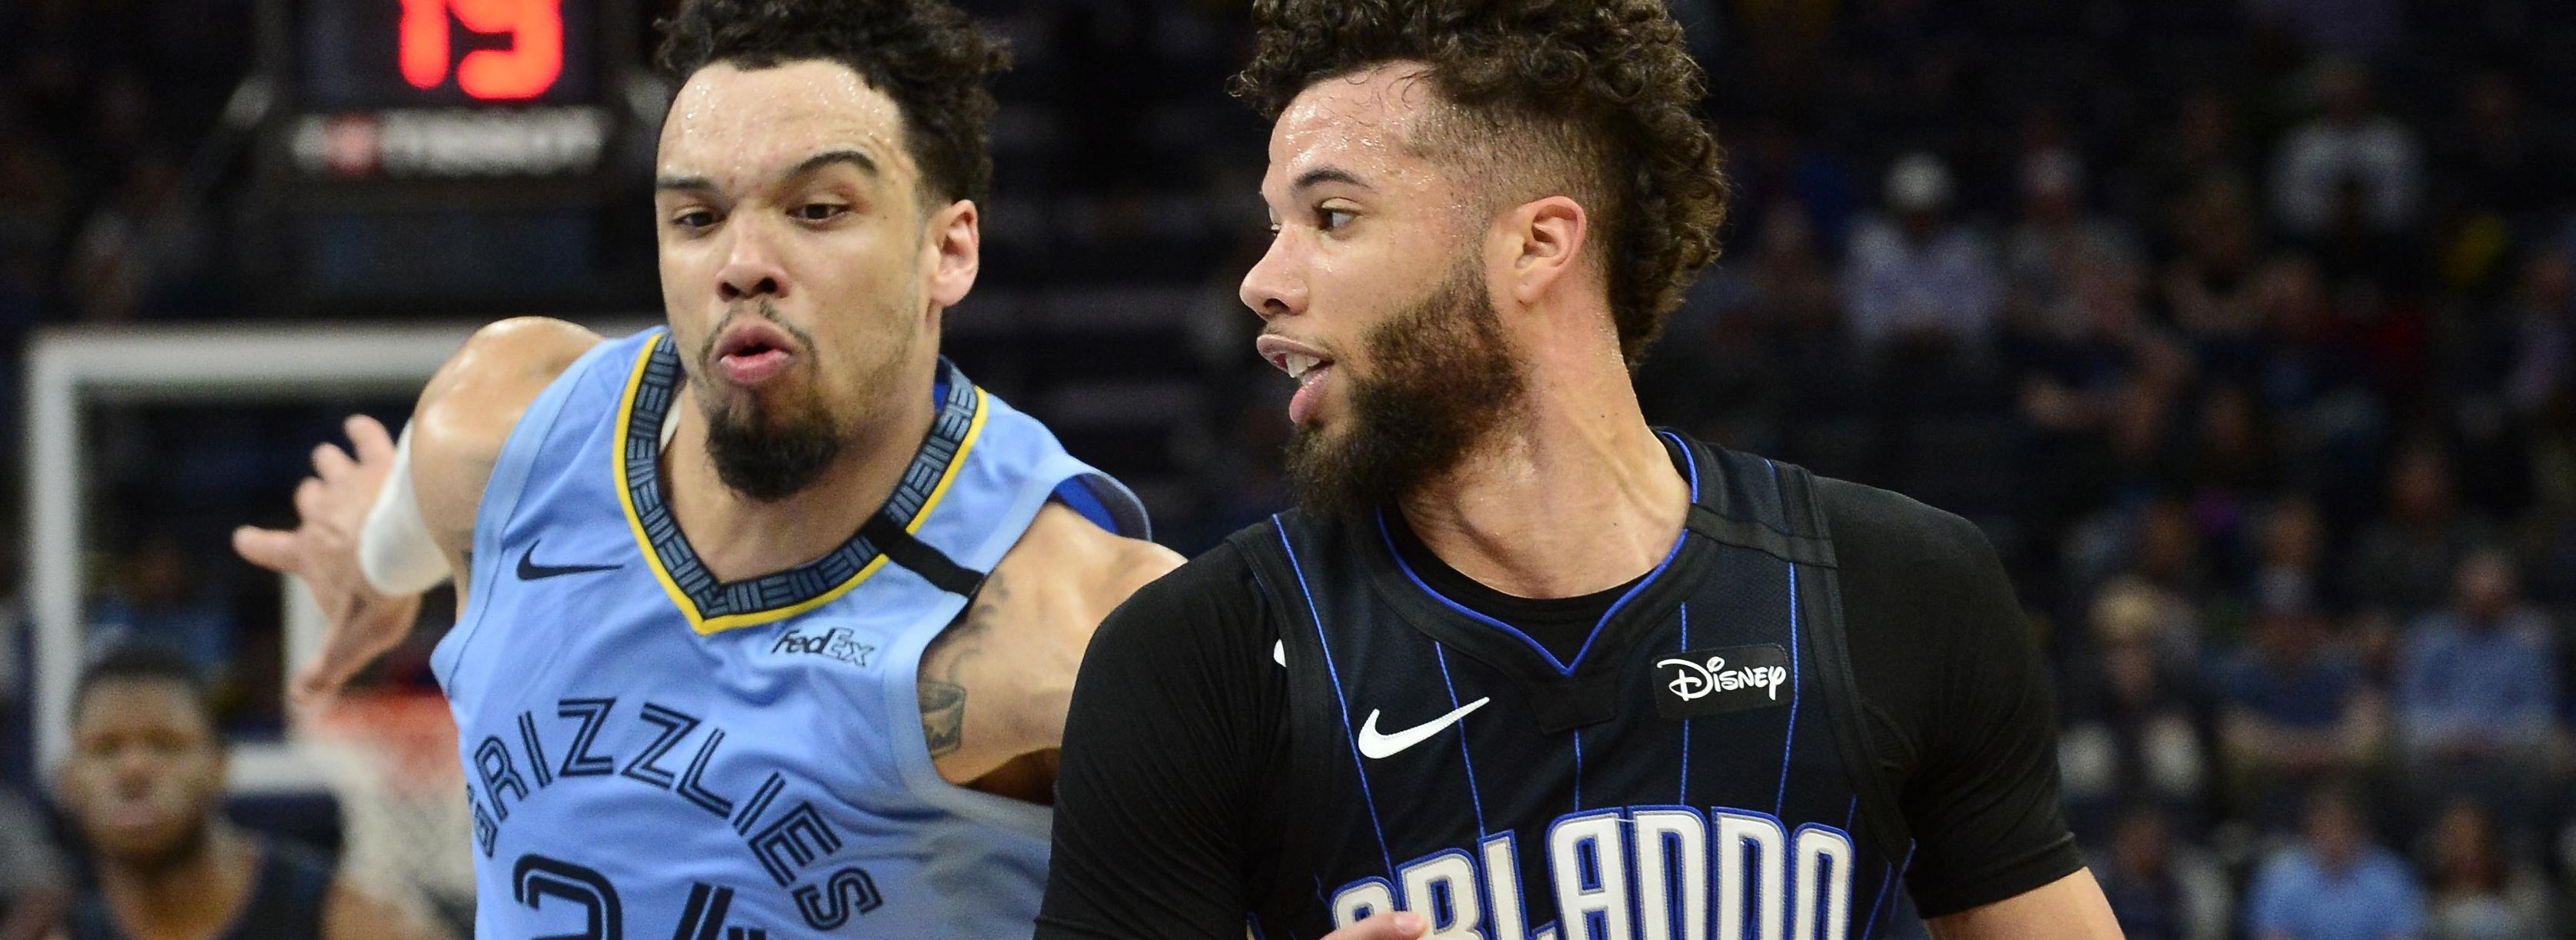 Orlando Magic Vs Brooklyn Nets Pick July 31 2020 Odds Com